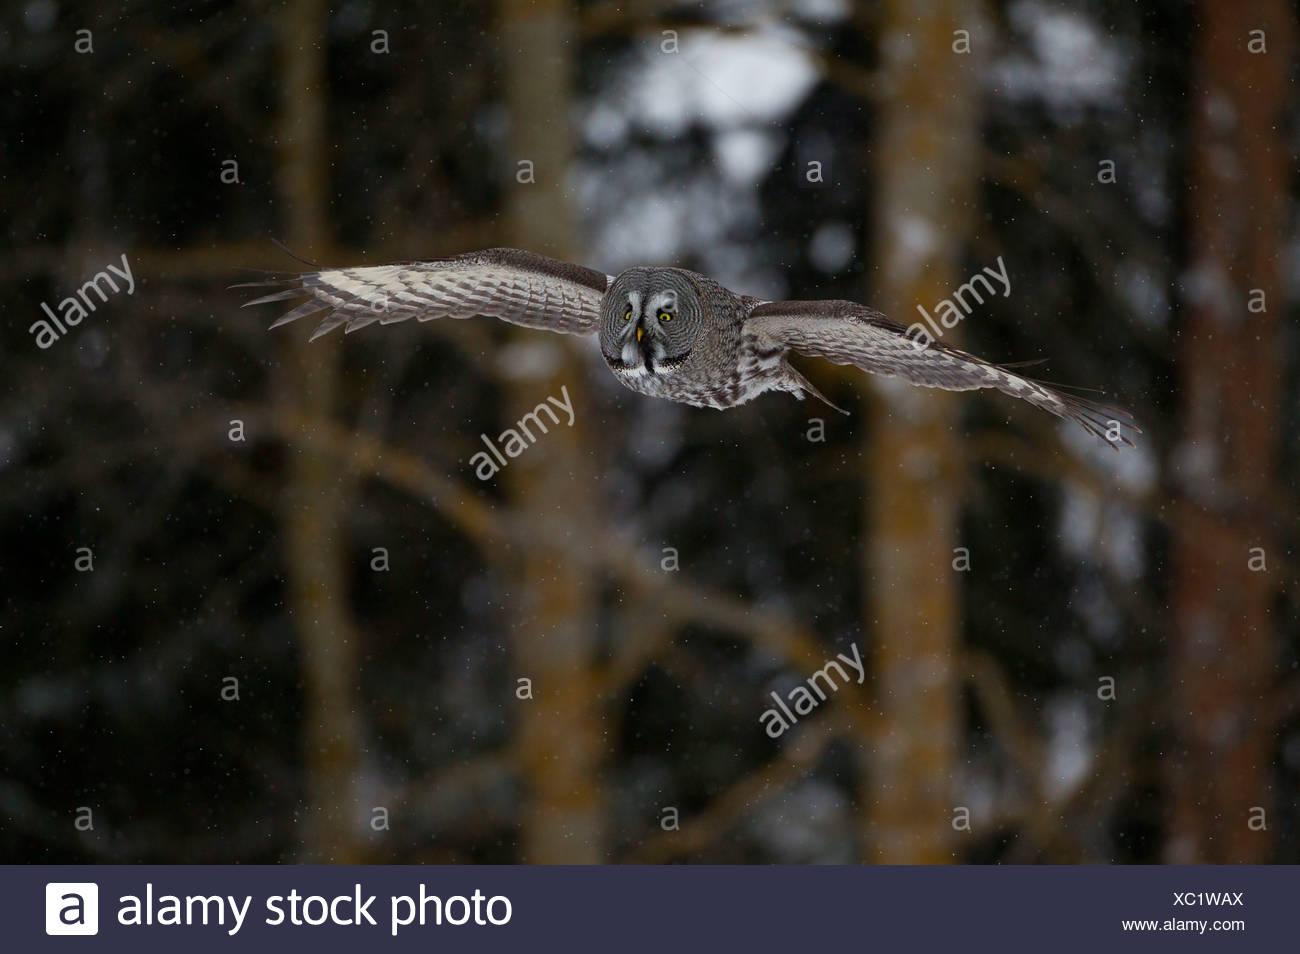 Great Grey Owl or Great Gray Owl (Strix nebulosa) in flight, winter, Oulu, Northern Ostrobothnia, Finland - Stock Image